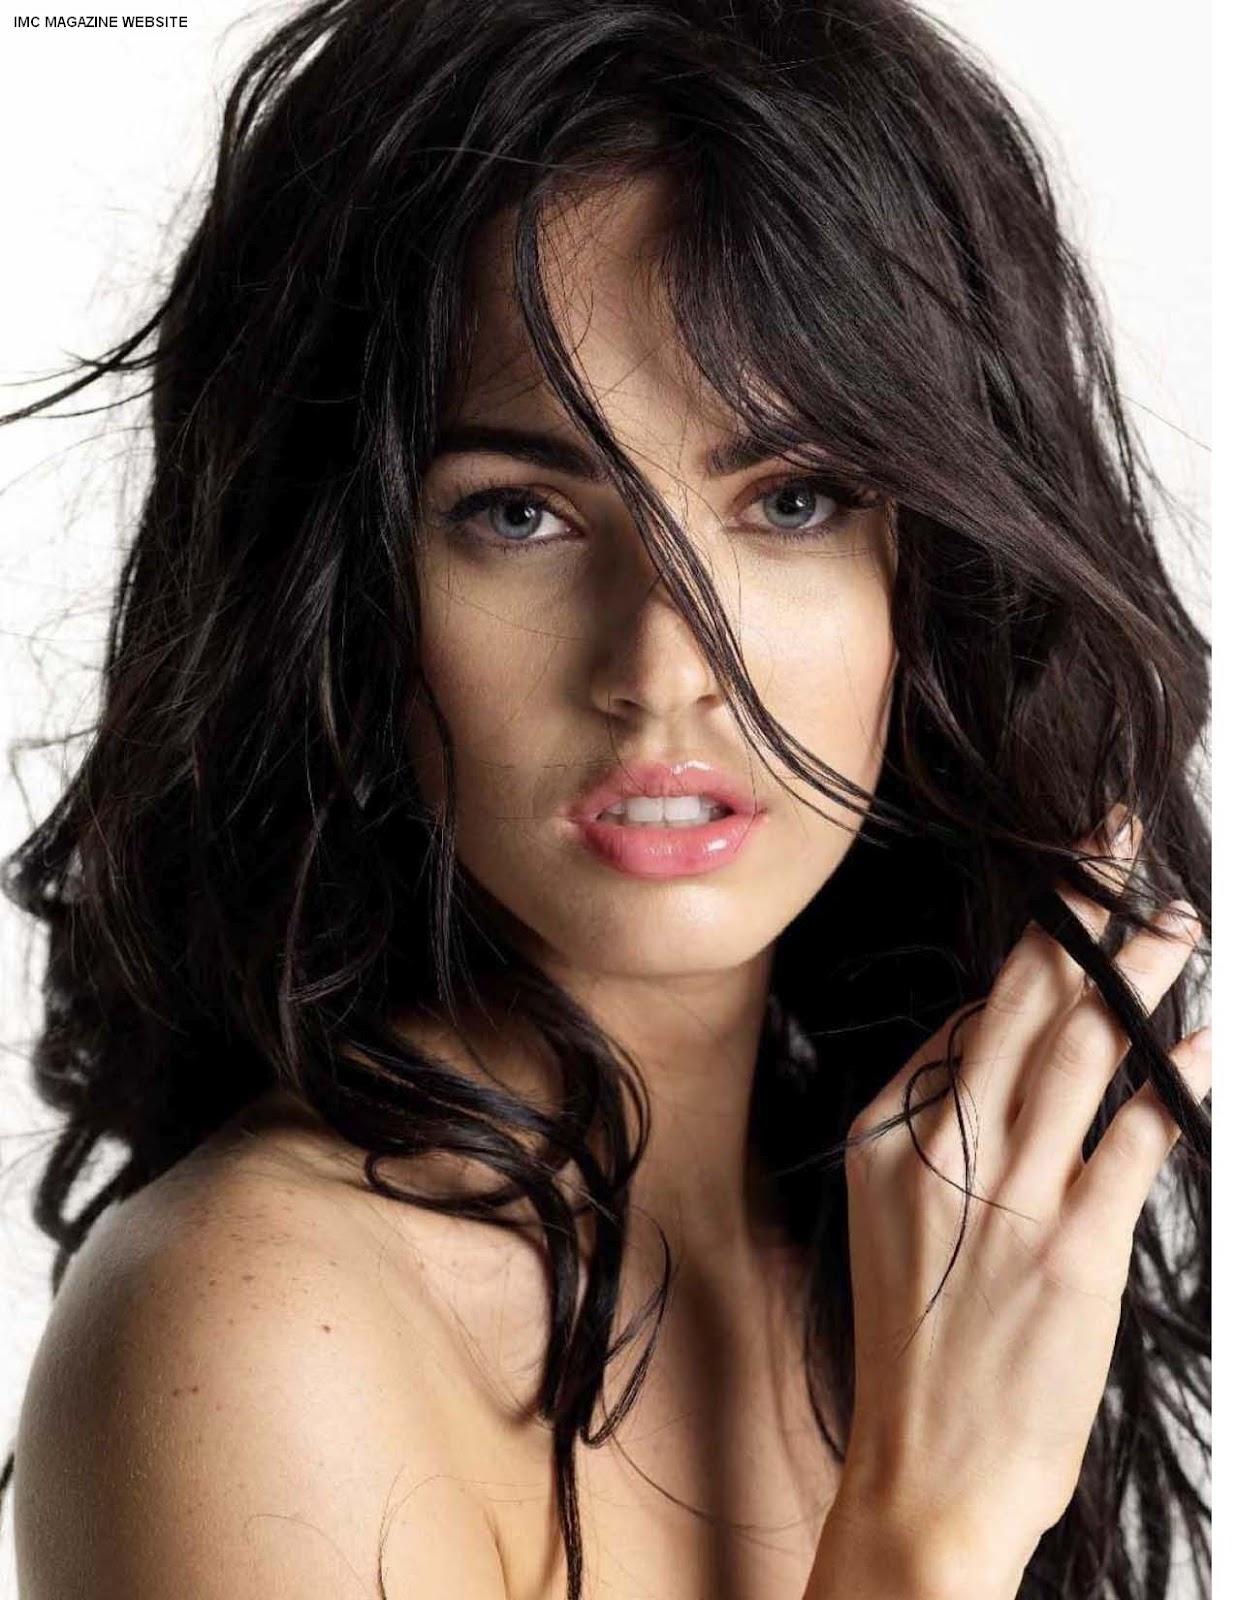 View Megan Fox Sexiest Woman wallpaper | Download Megan Fox Sexiest ... Megan